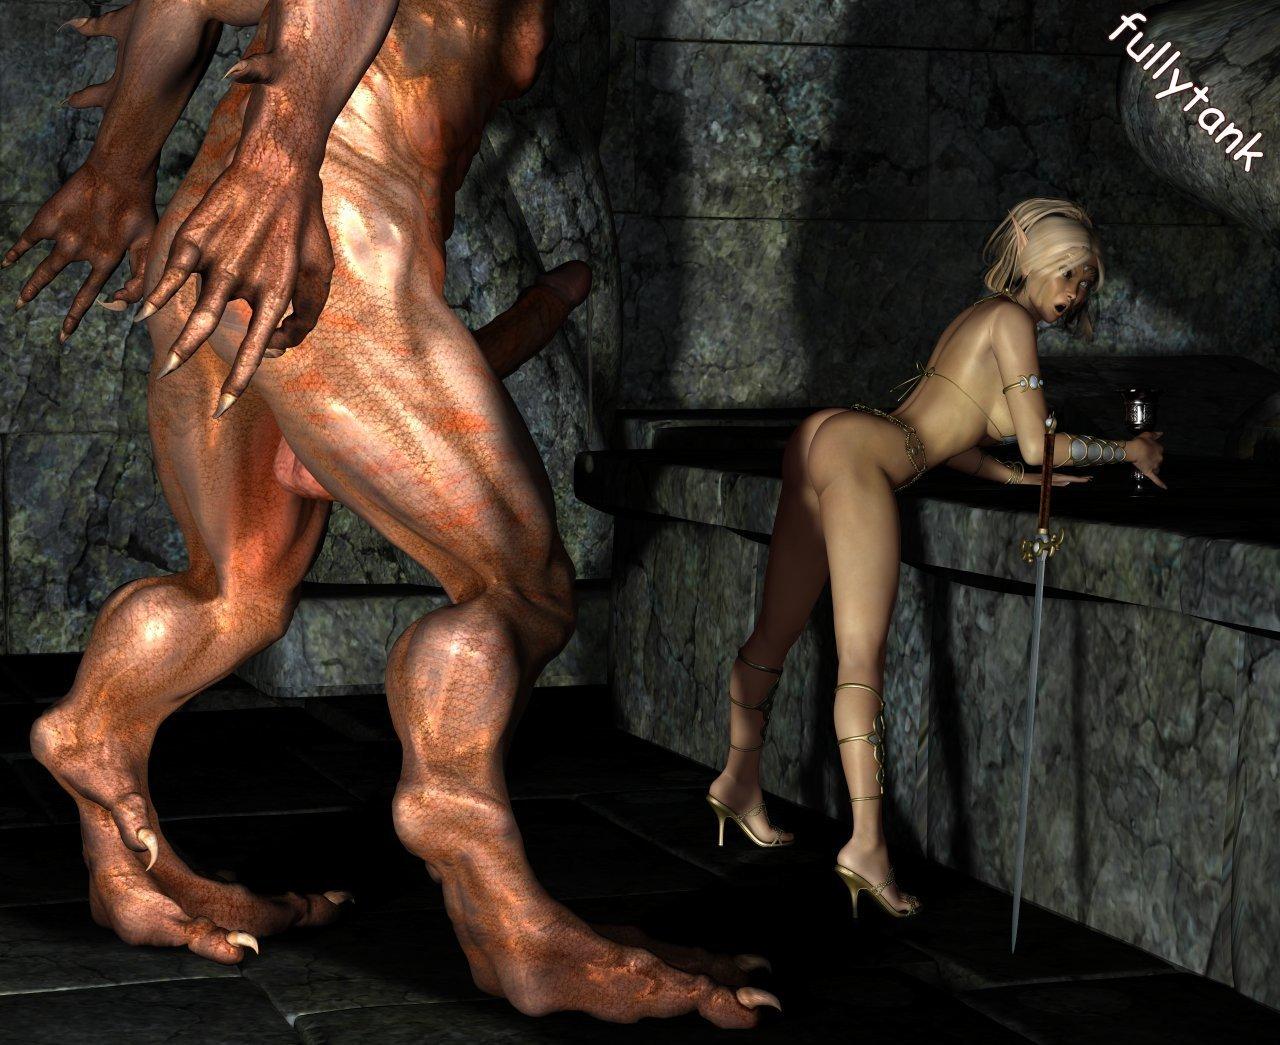 мульт порно онлайн с чудовищами